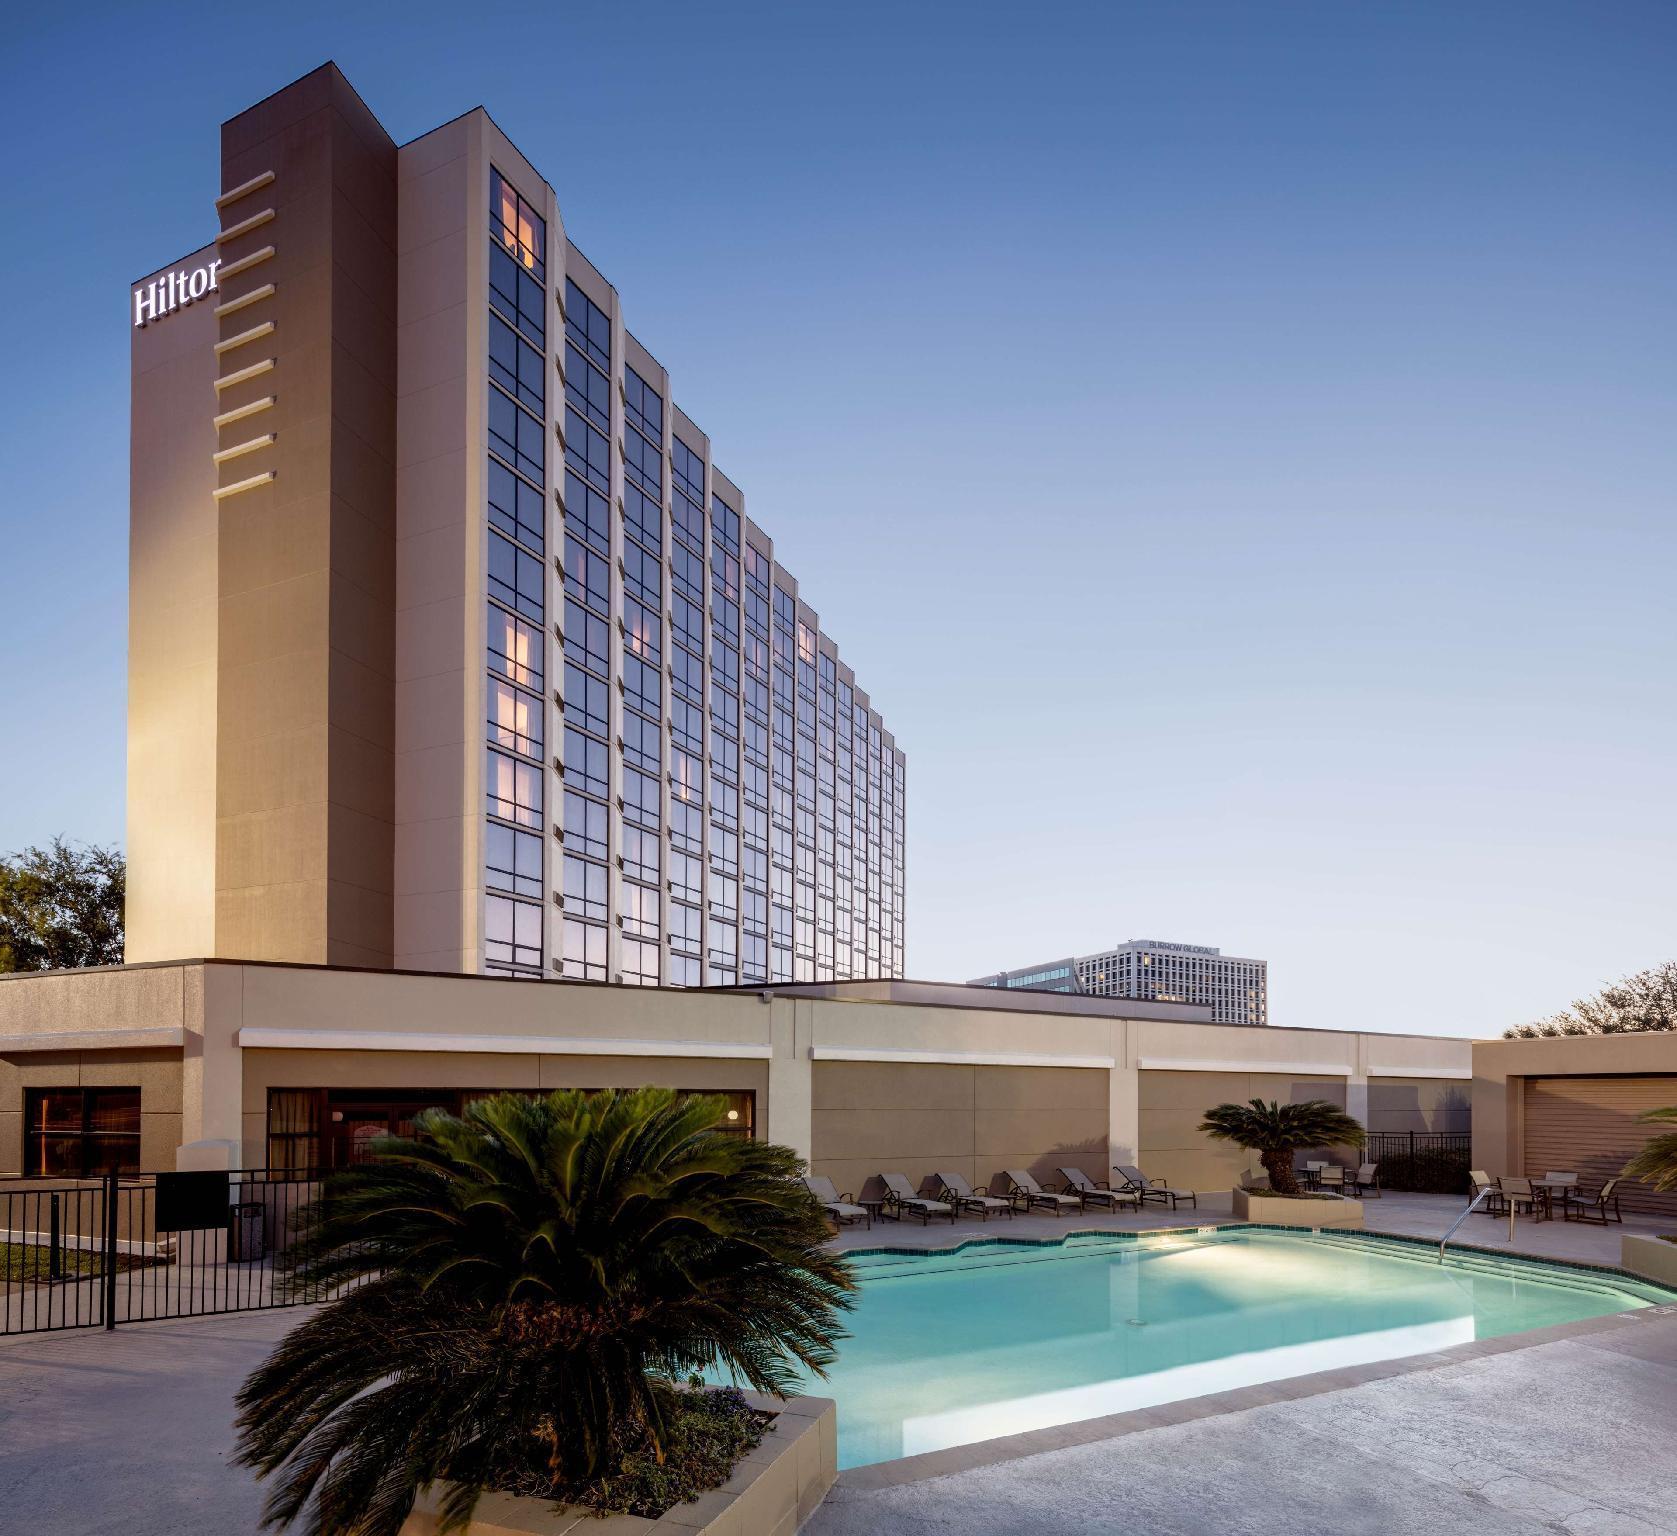 Hilton Houston Galleria Area